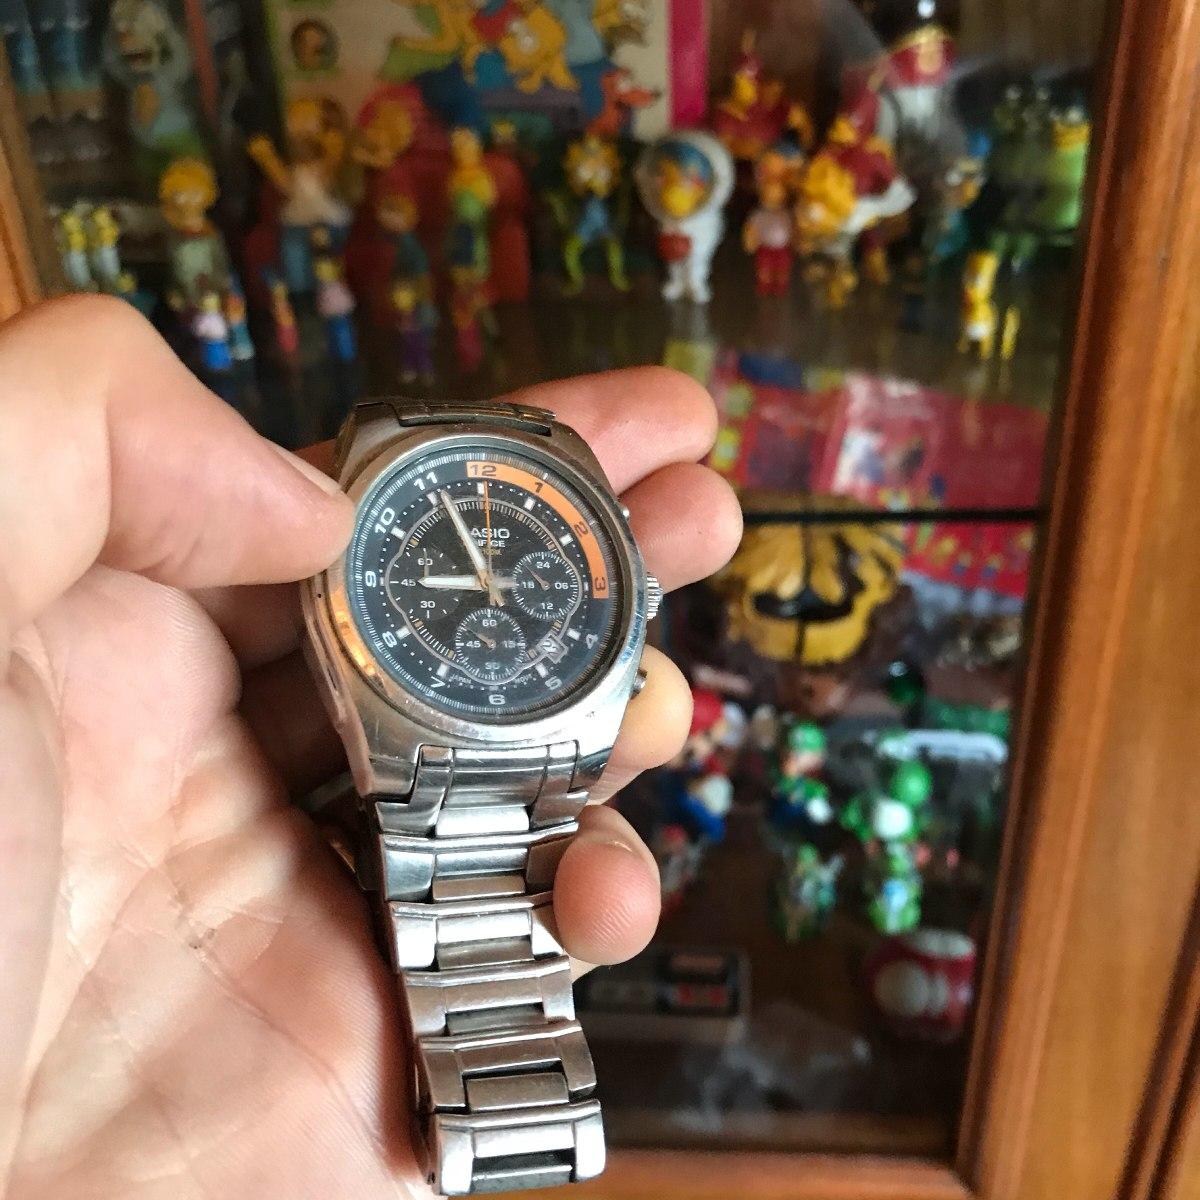 0d17d9700aca cronografo casio reloj pulsera de alta gama o rolex. Cargando zoom.